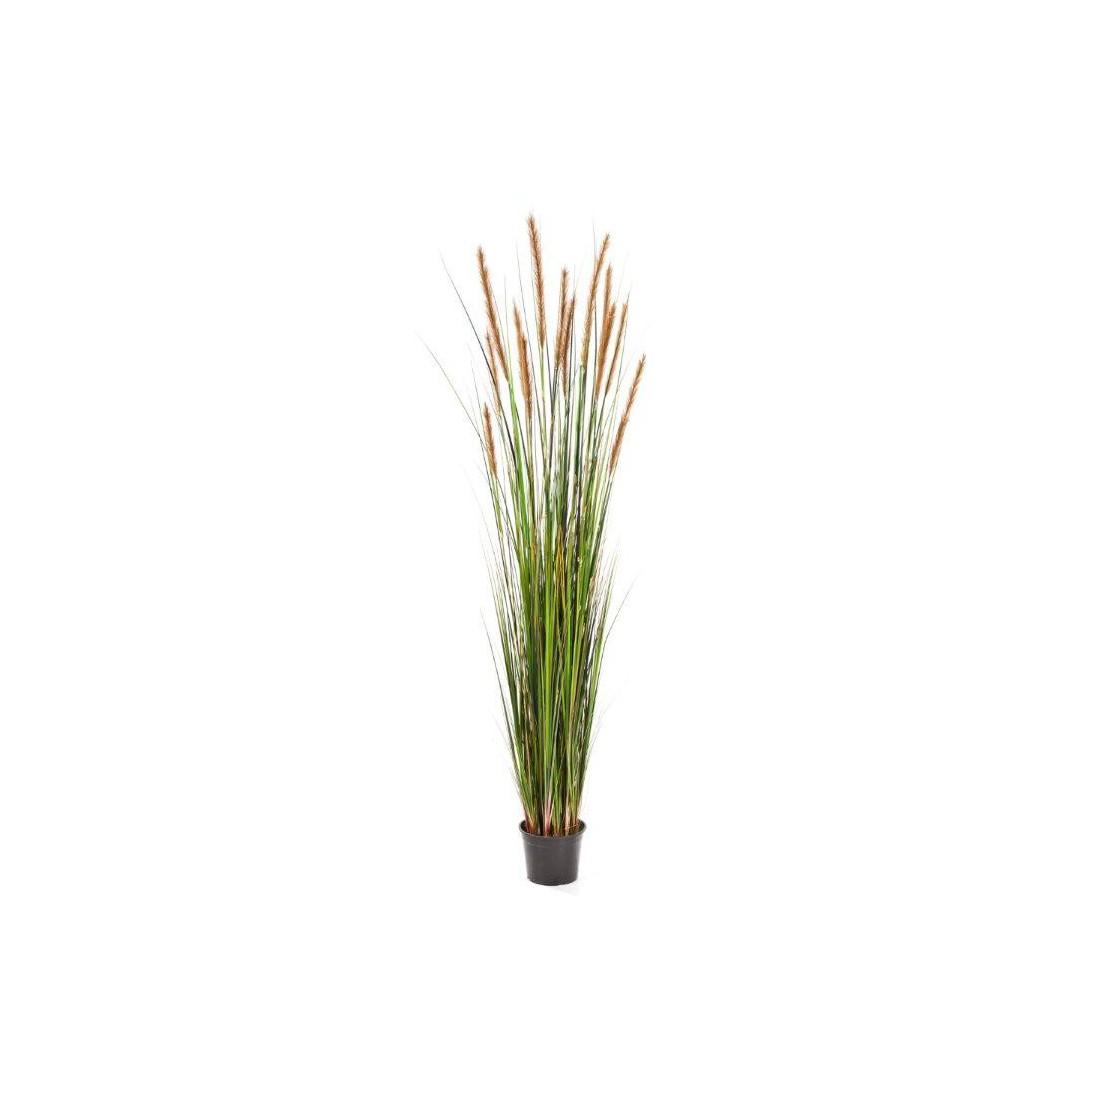 herbe de roseau artificielle 150cm graminees gramin es artificielles artificielles reflets. Black Bedroom Furniture Sets. Home Design Ideas